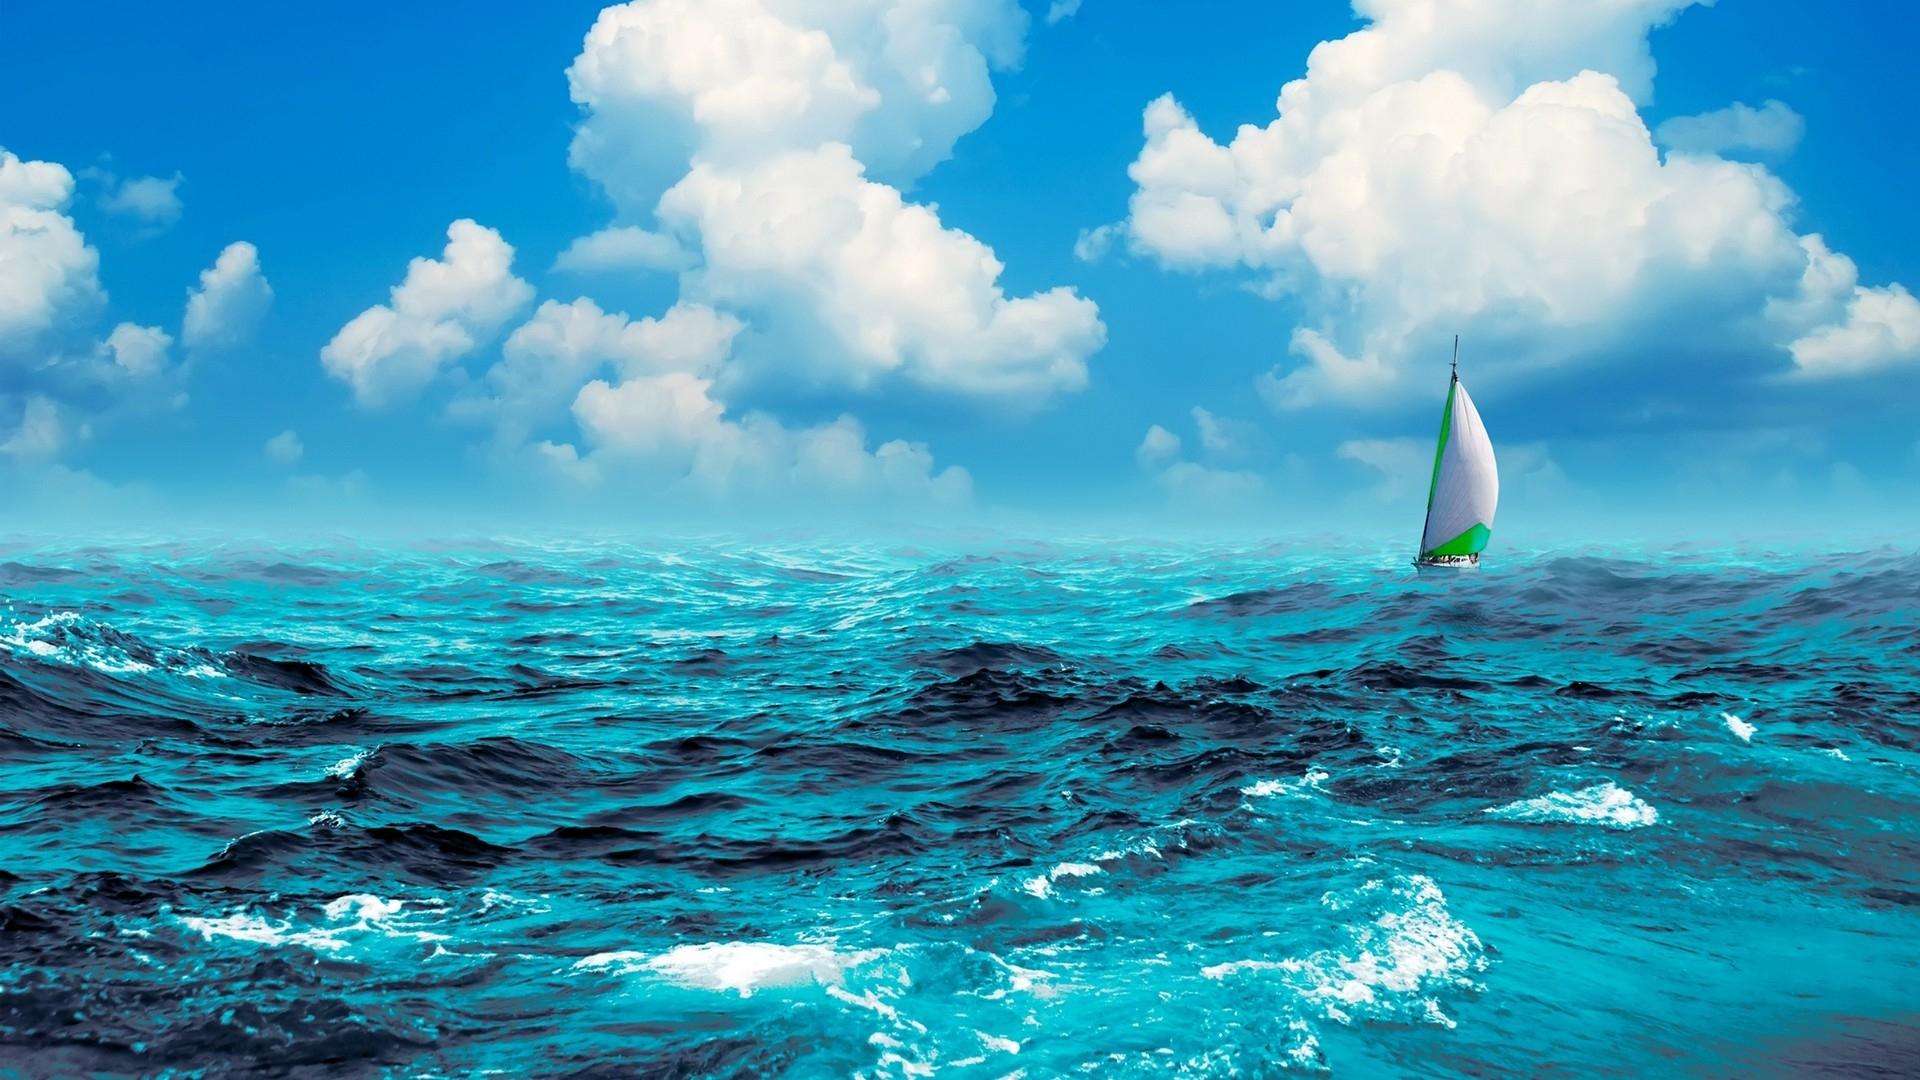 manipulation cg digital art artistic nature ocean sea waves swell water sky clouds sailing sports boat